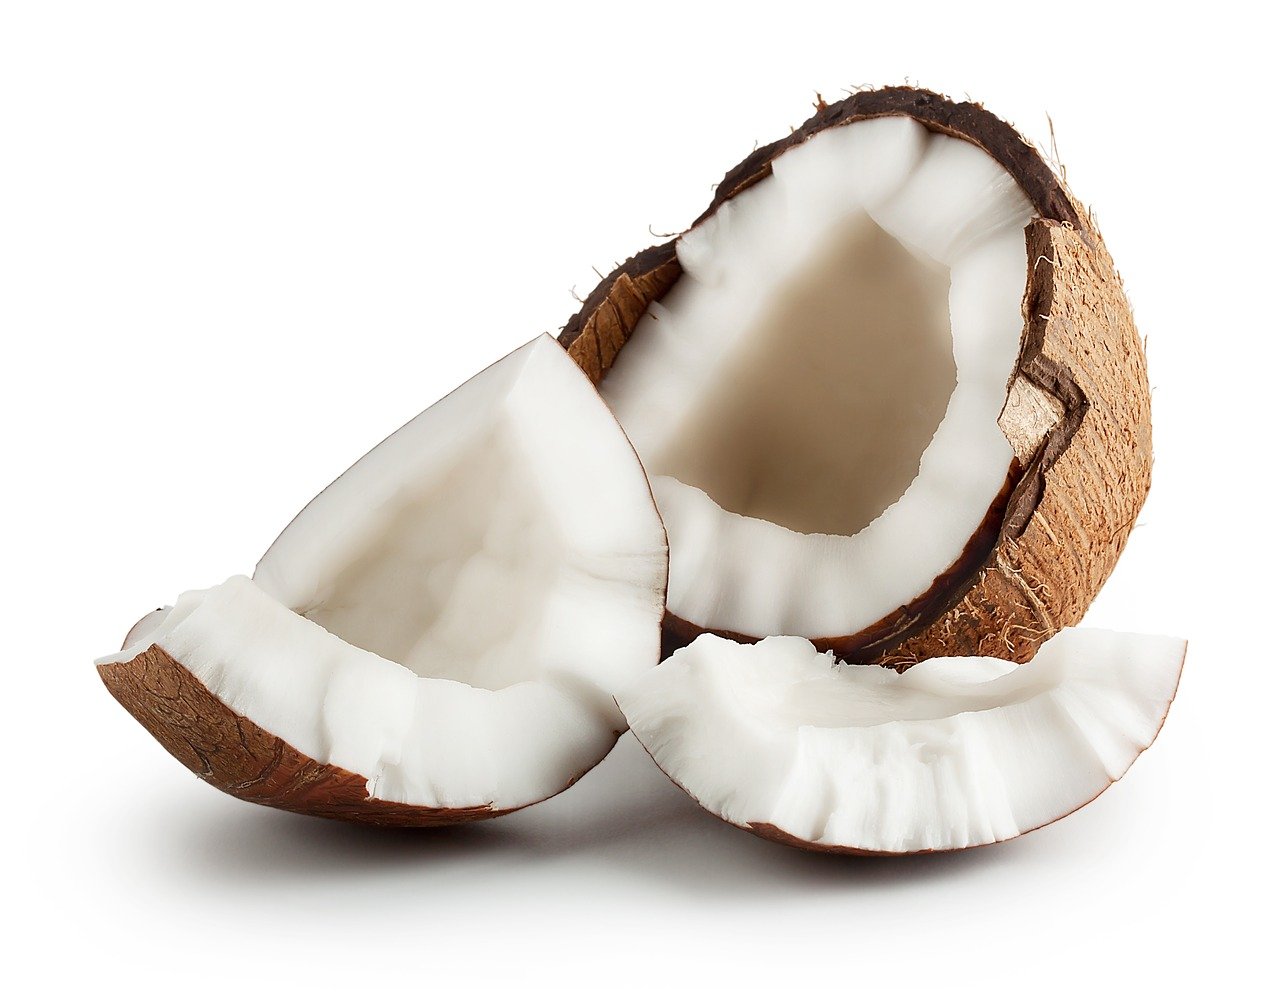 rozbitý kokos